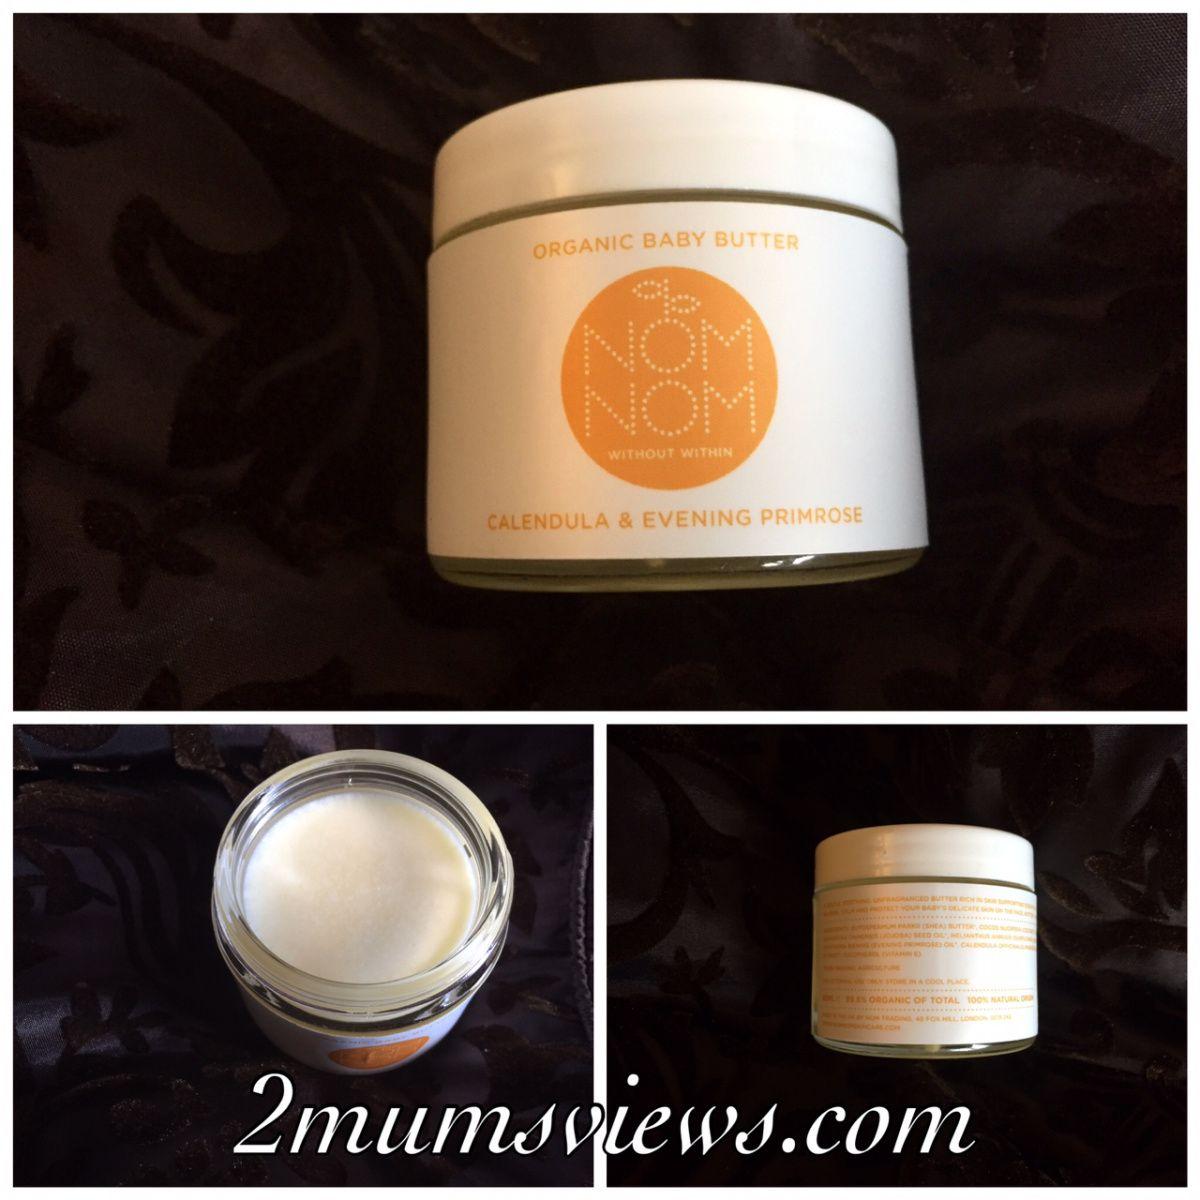 Nom Nom Organic Baby Butter – Calendula and Evening Primrose Review